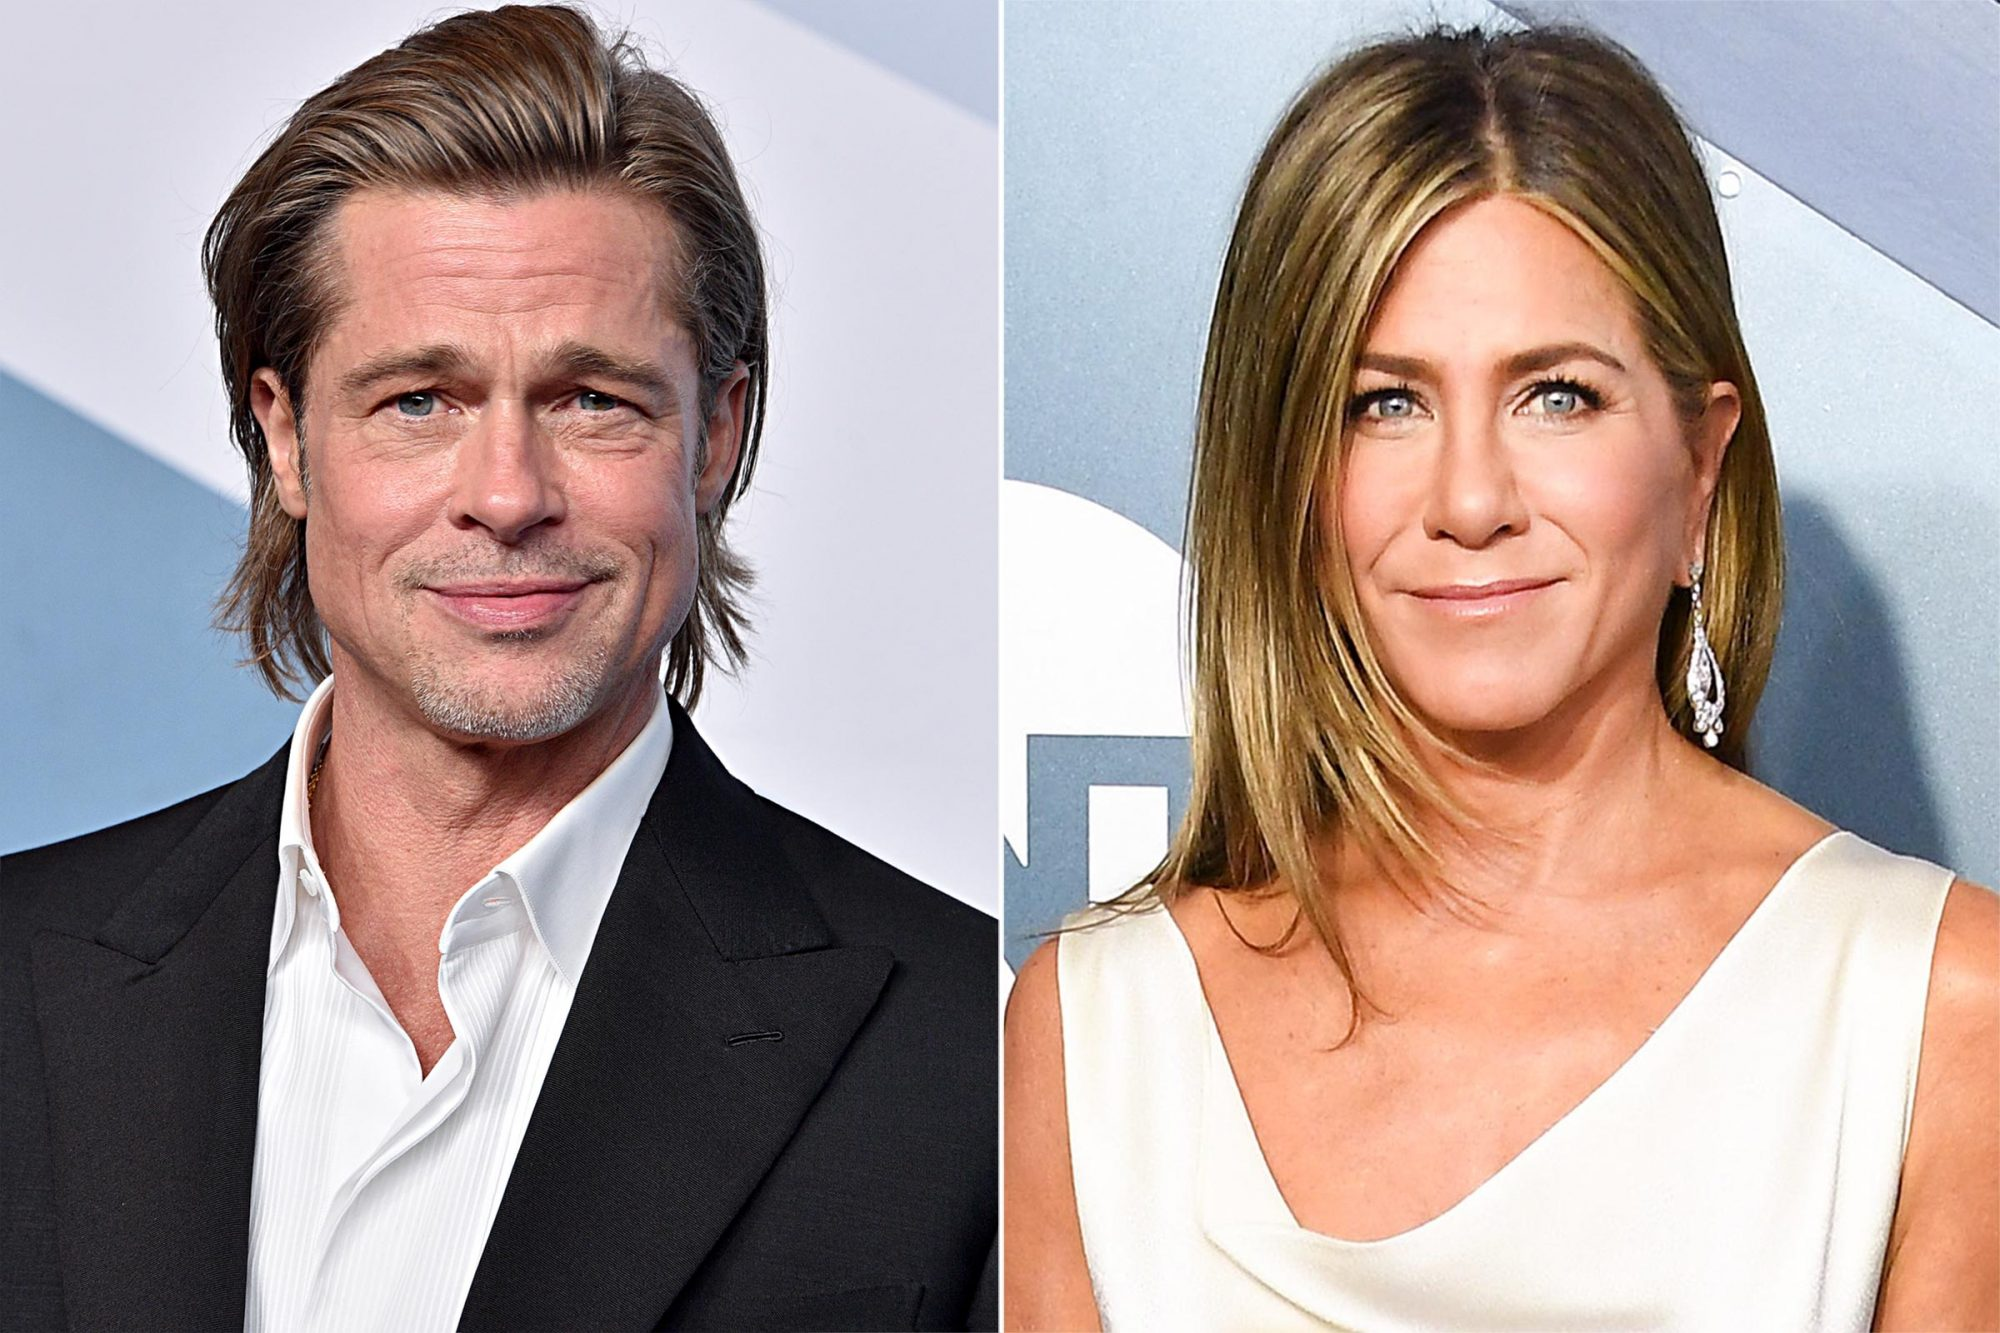 Brad Pitt / Jennifer Aniston